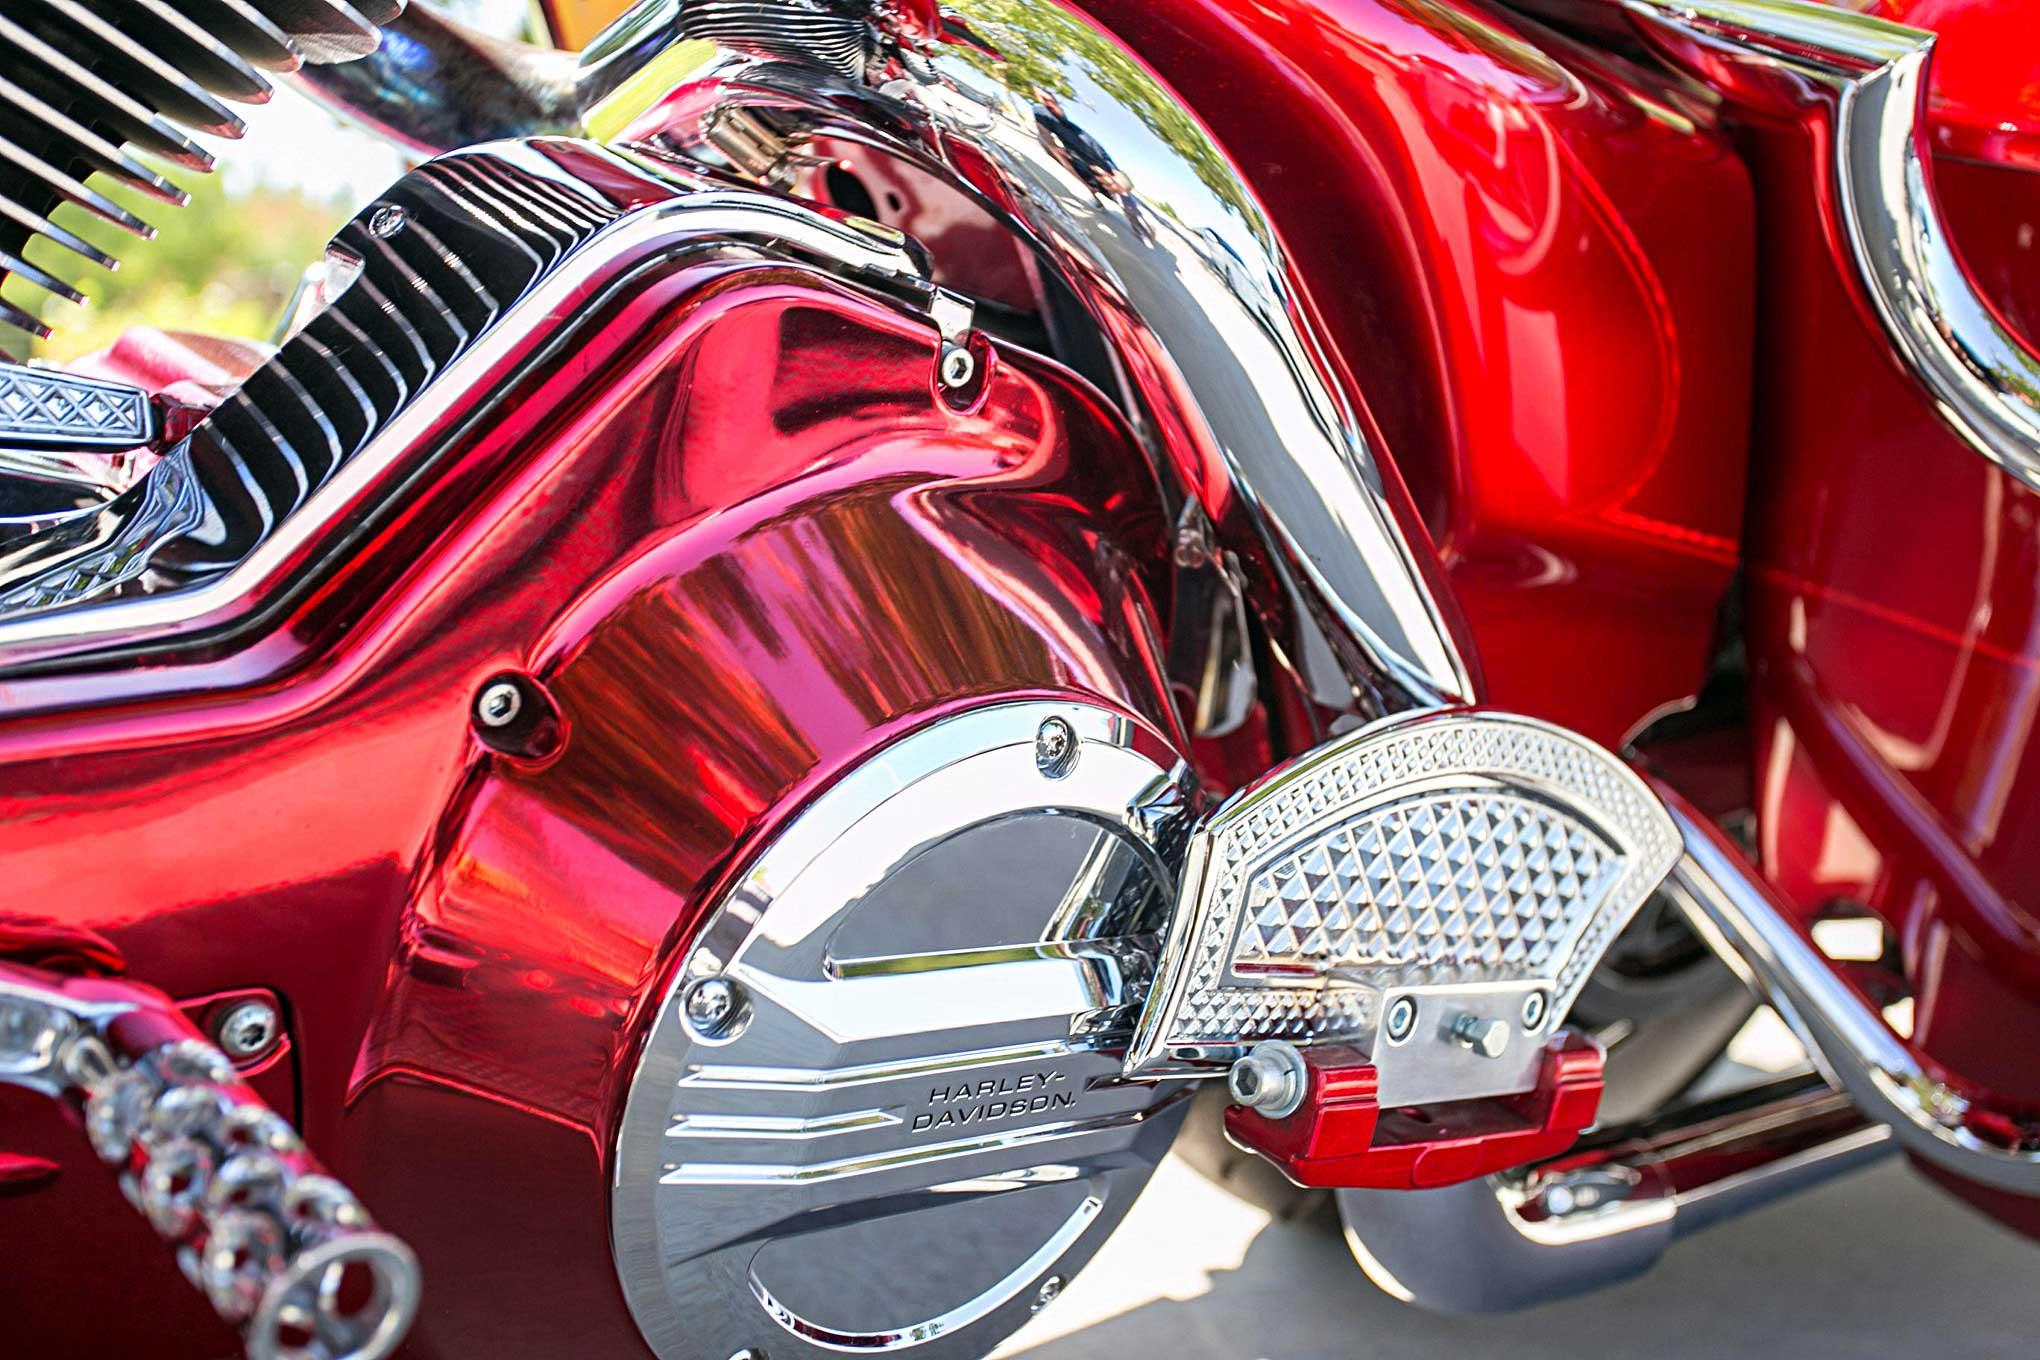 Serafin Romero S 2005 Harley Davidson Road King